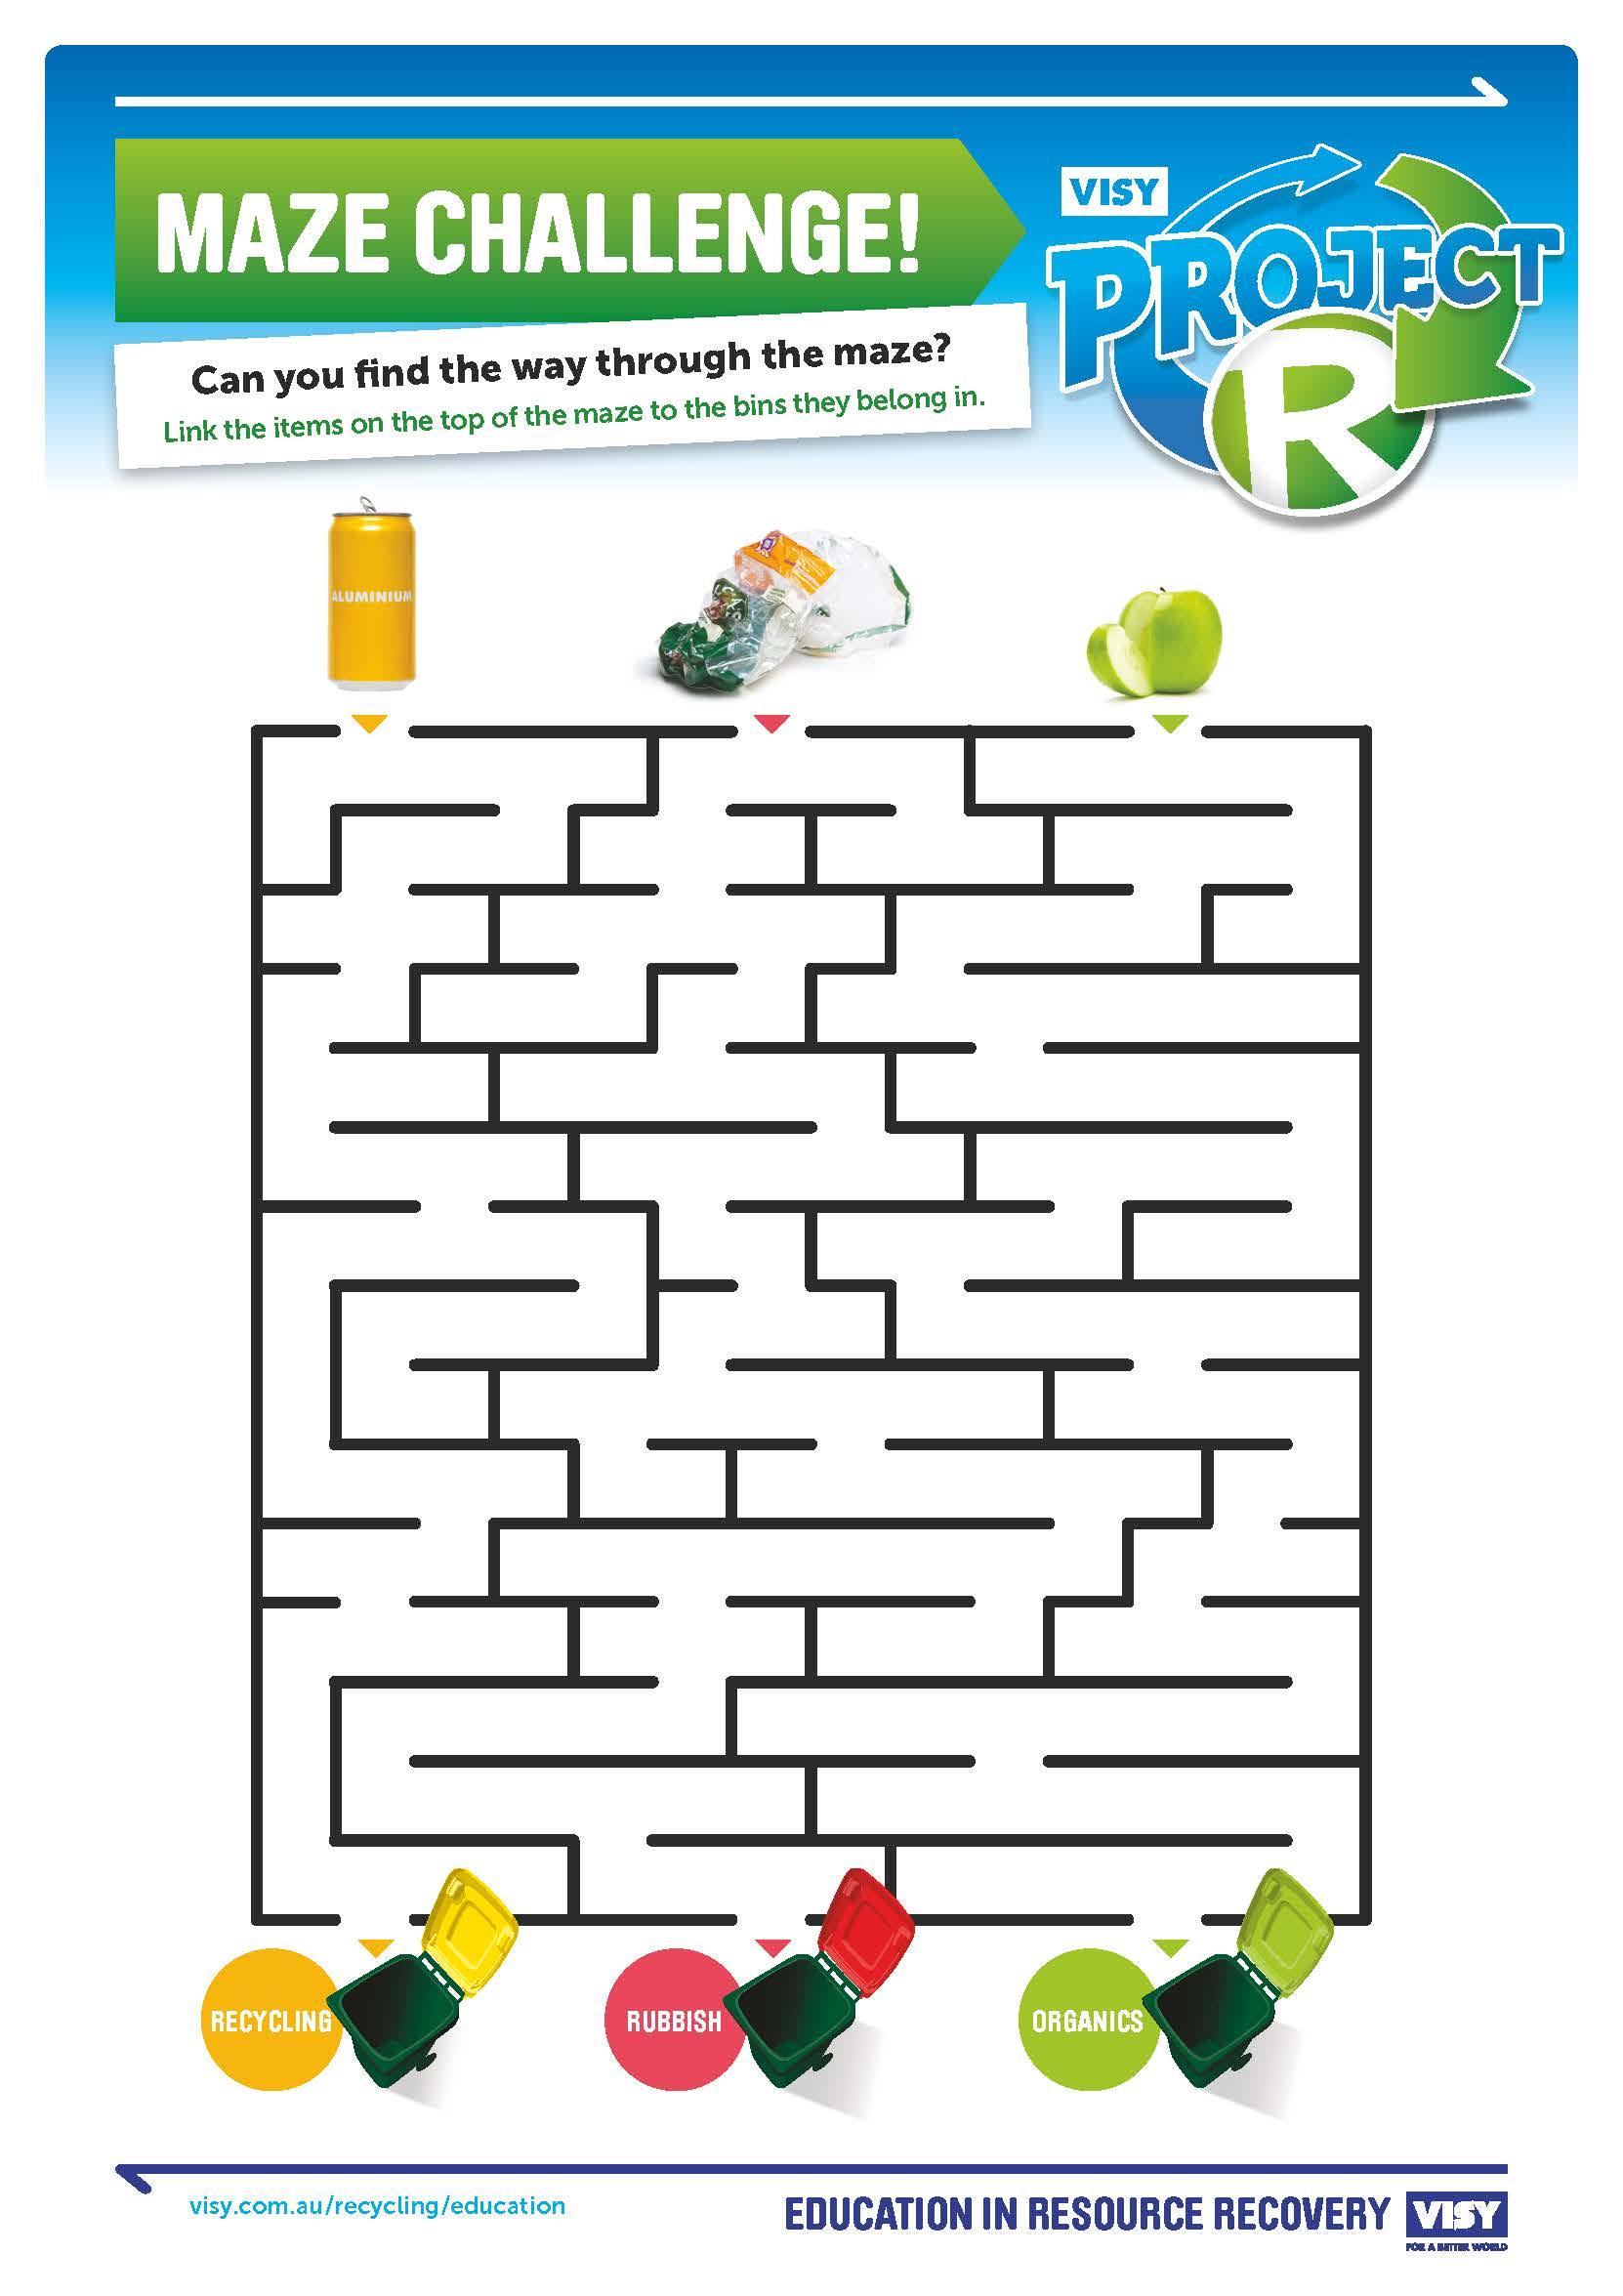 Teaching Kids to Recycle | Earth911.com